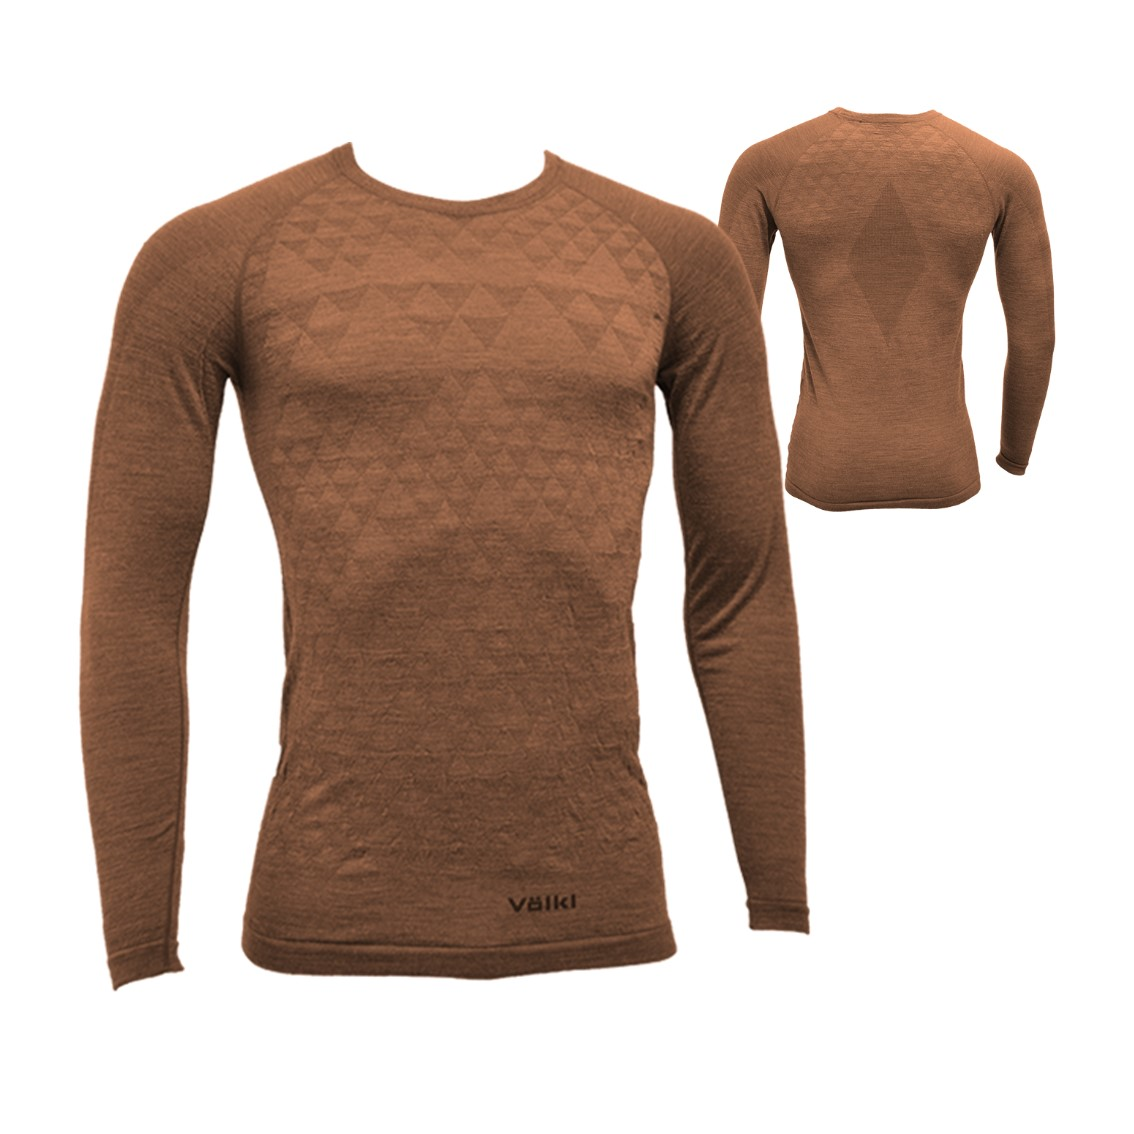 OEM ODM customize men wool sweater seamless